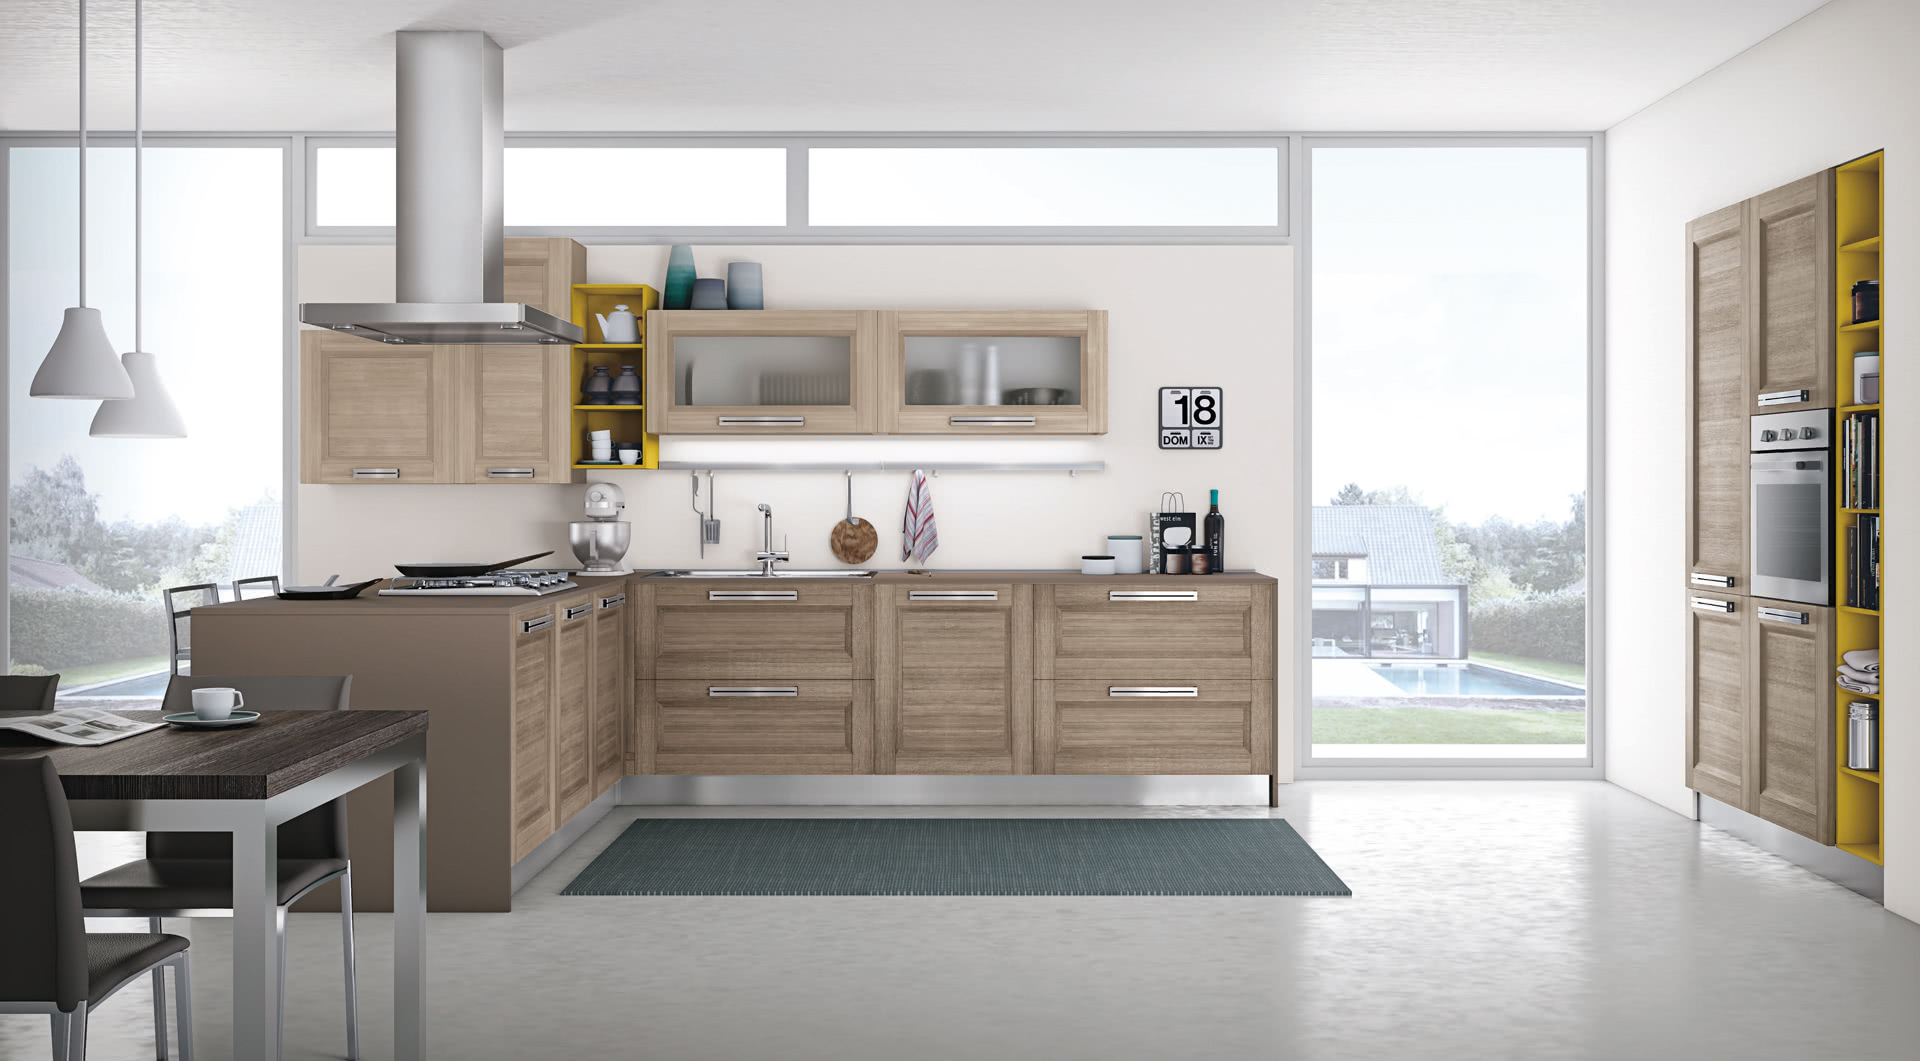 Cucina Mya - Cucine Moderne - Creo Kitchens